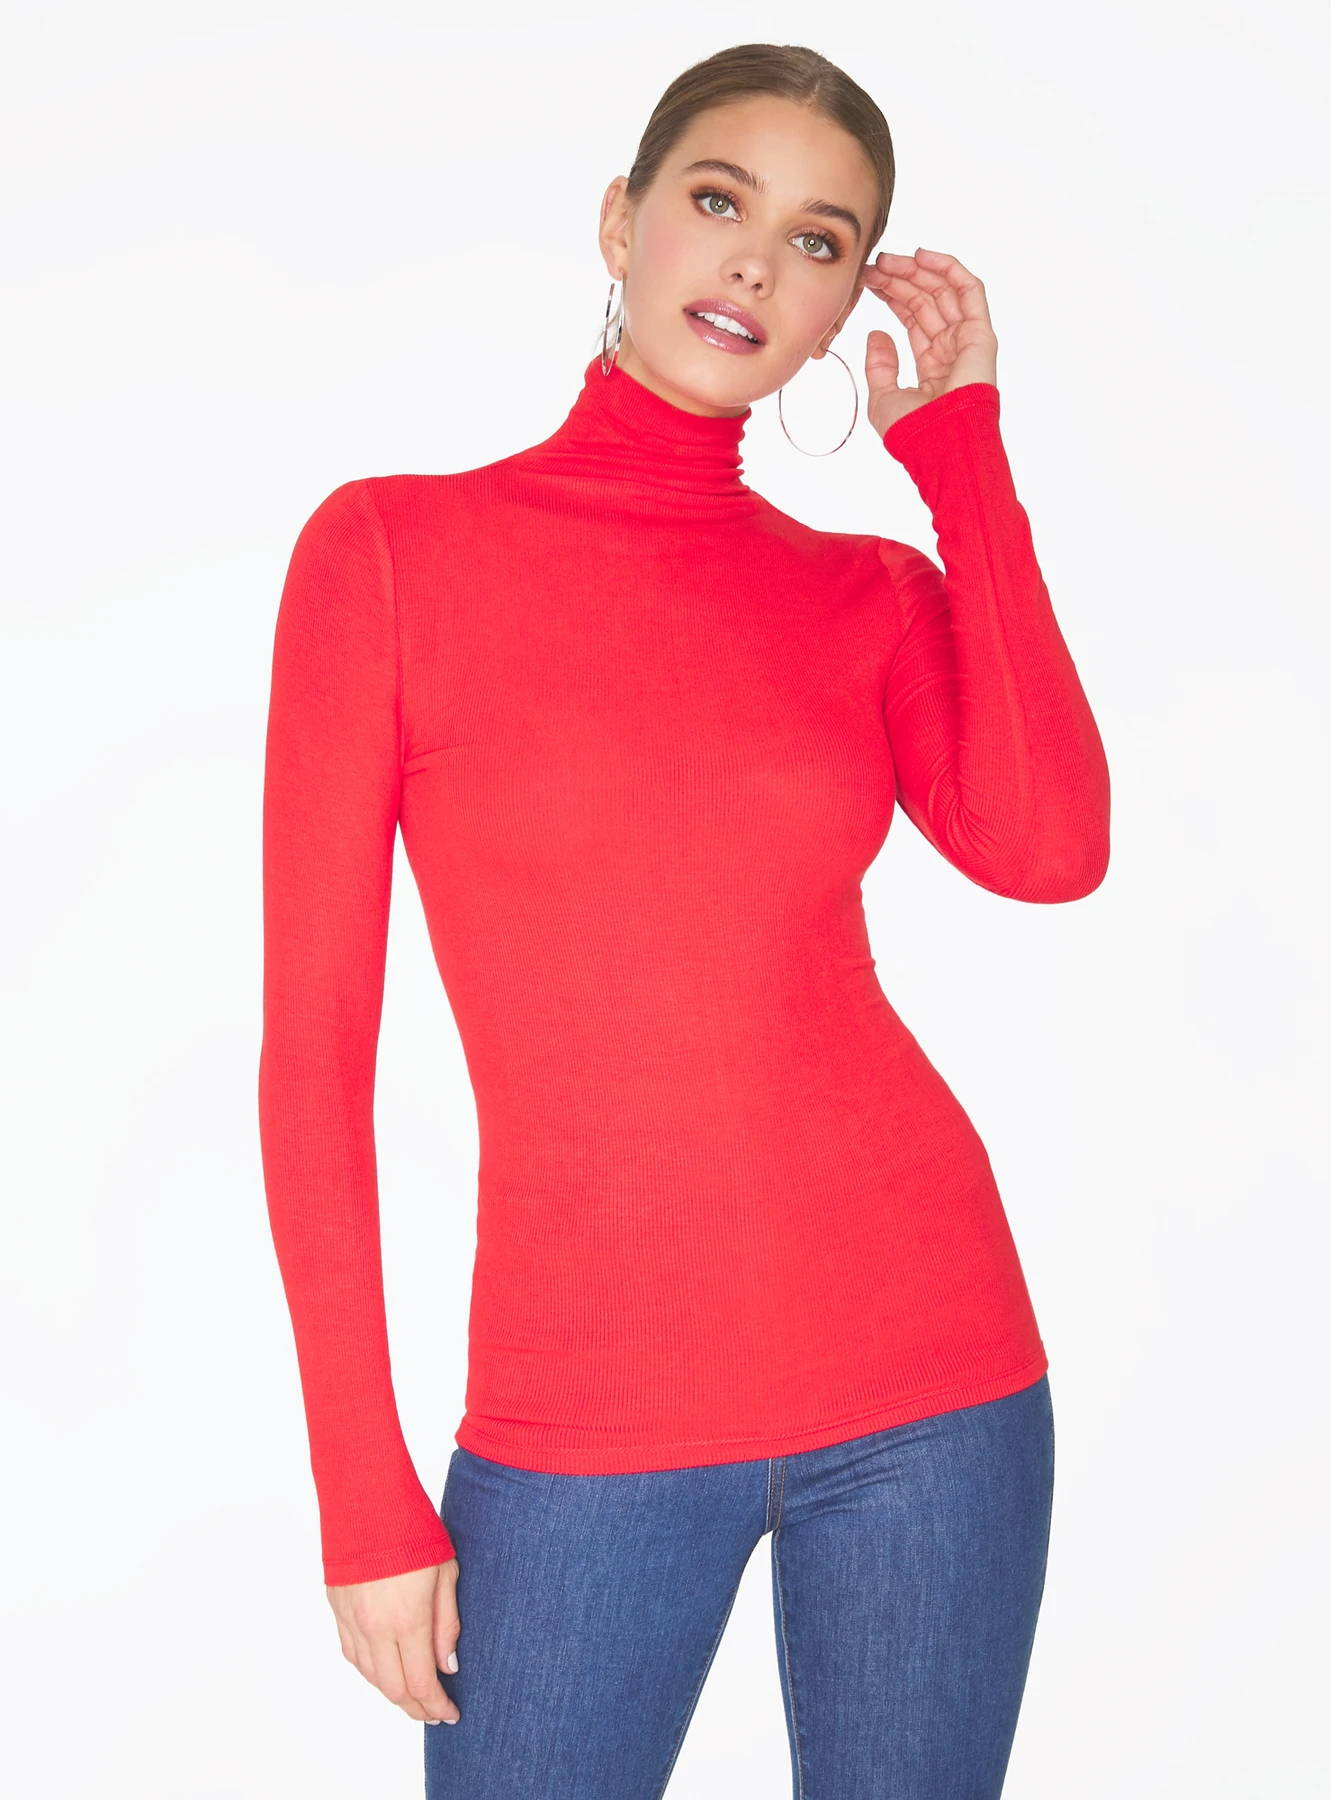 HeyYou Basic Red Ribbed Long Sleeve Turtleneck